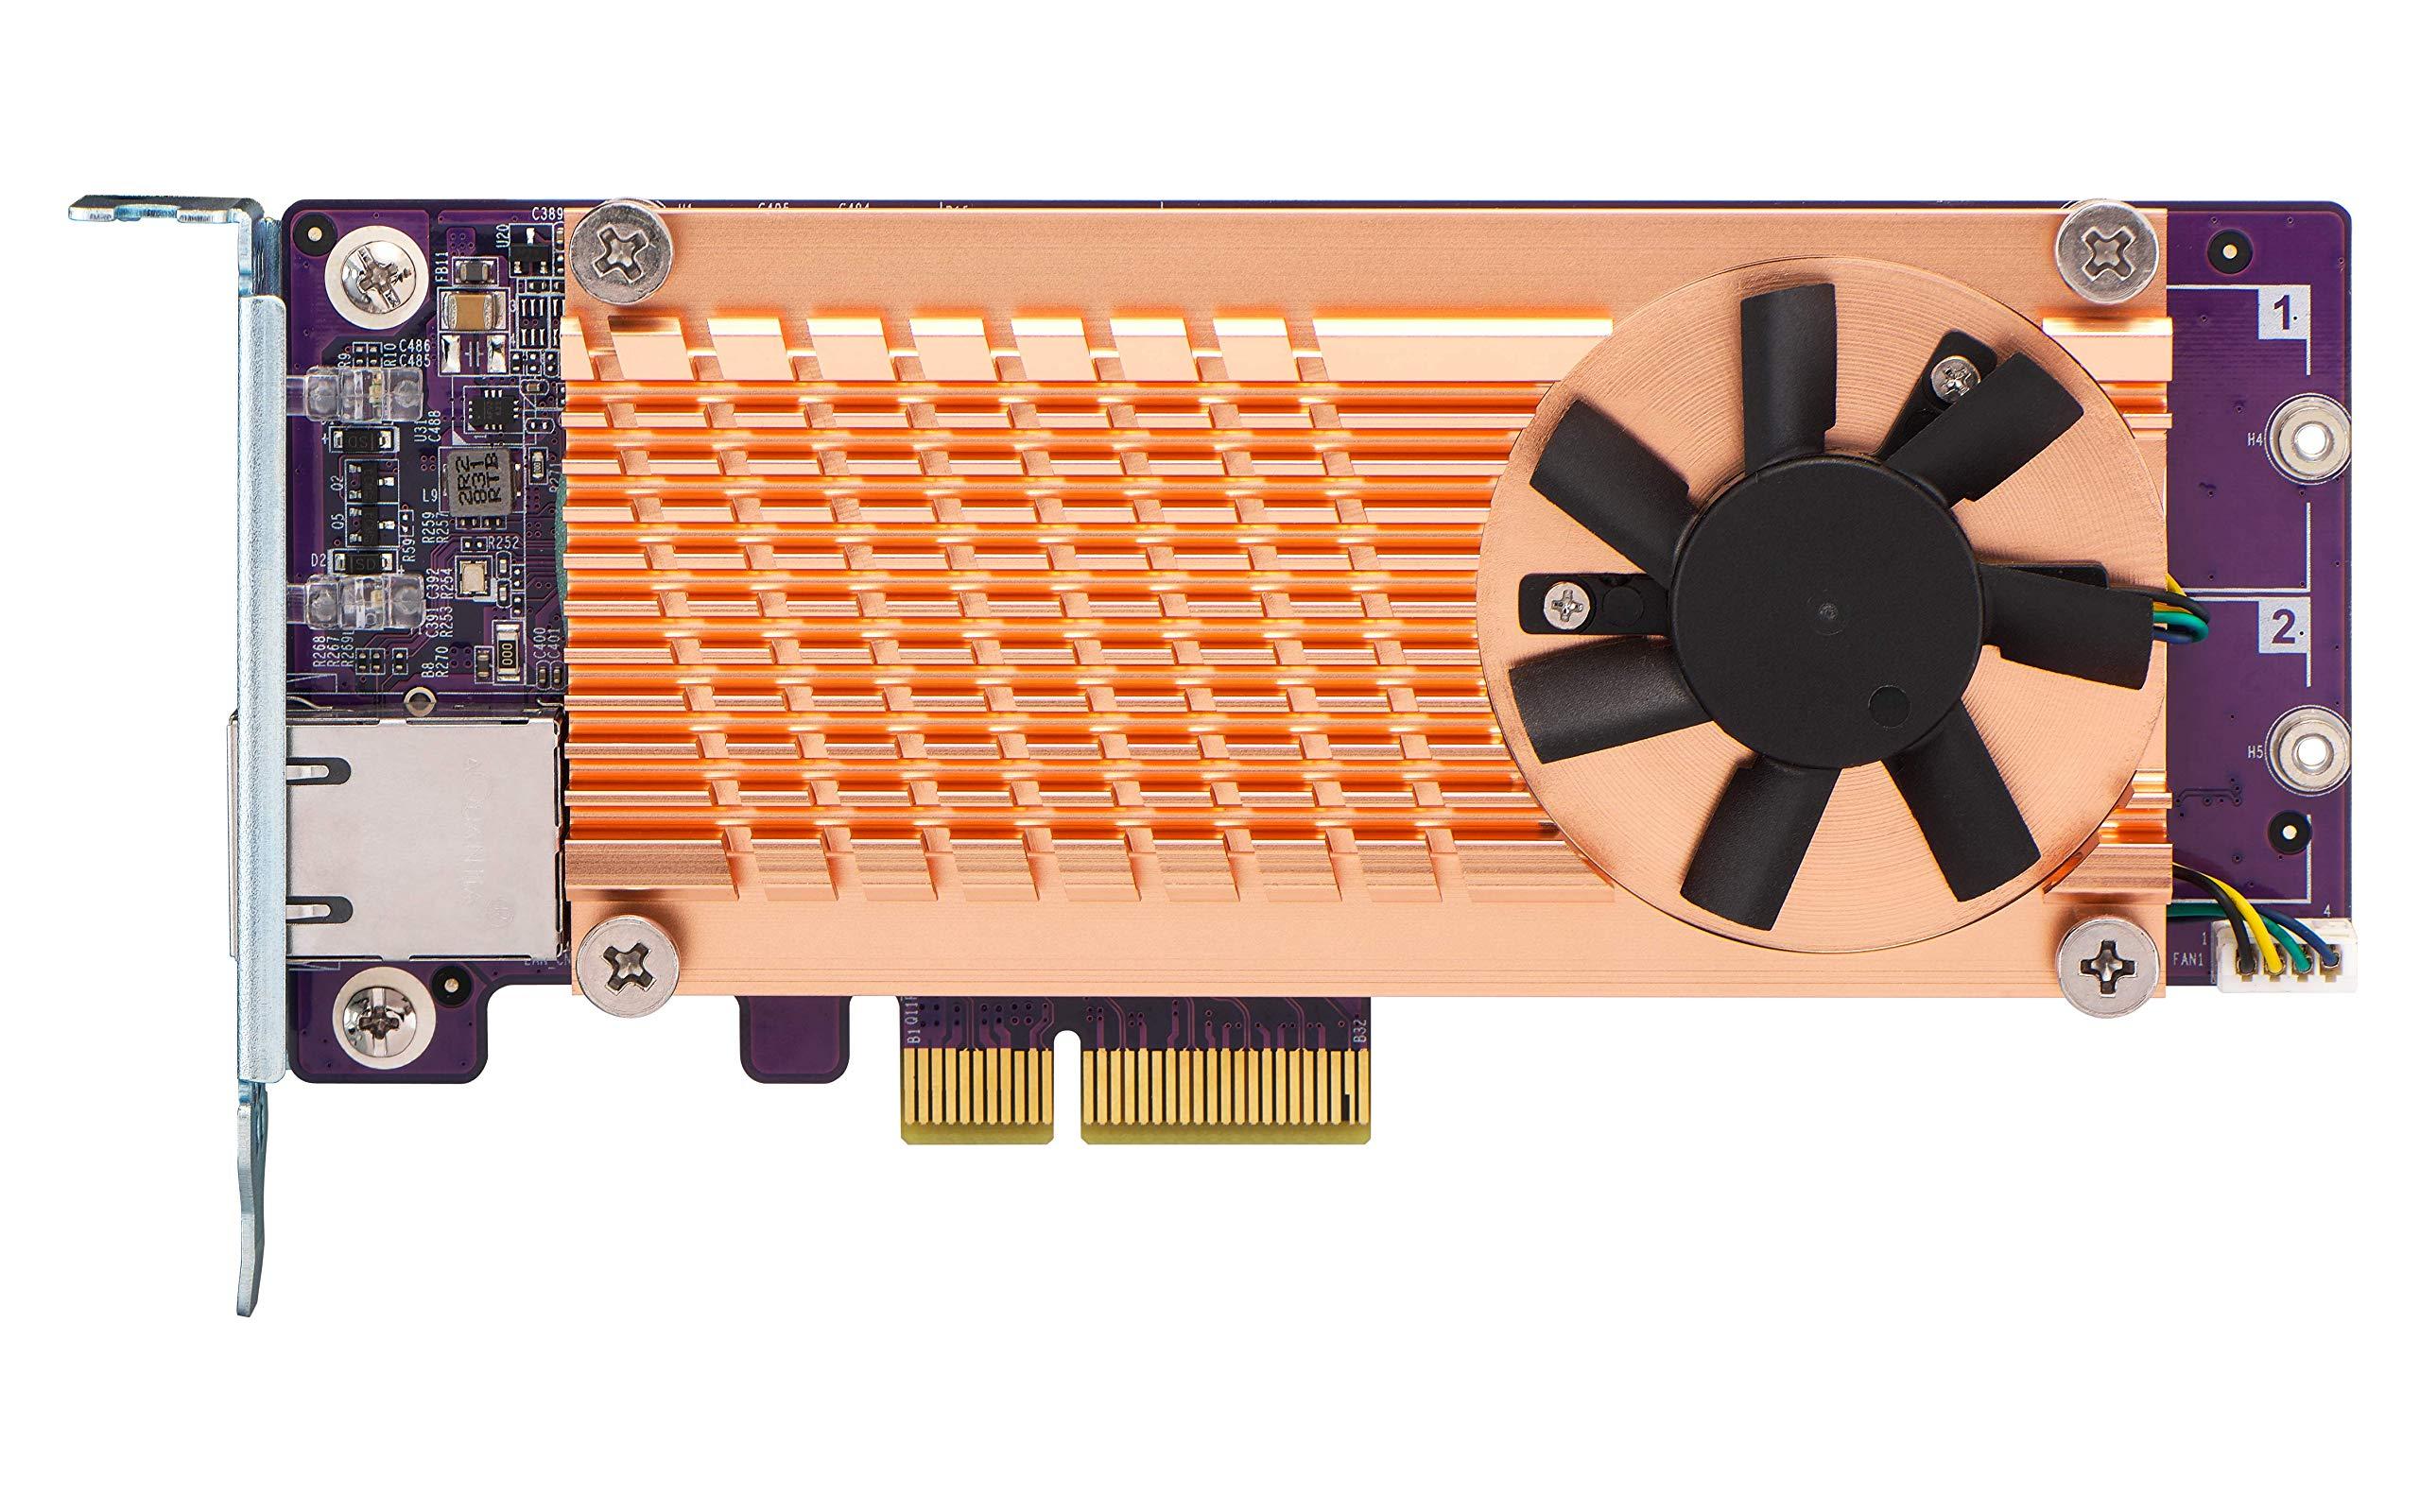 QNAP QM2-2P10G1TA PCIe Expansion Card with 2 x PCIe 2280 M.2 SSD Slots by QNAP